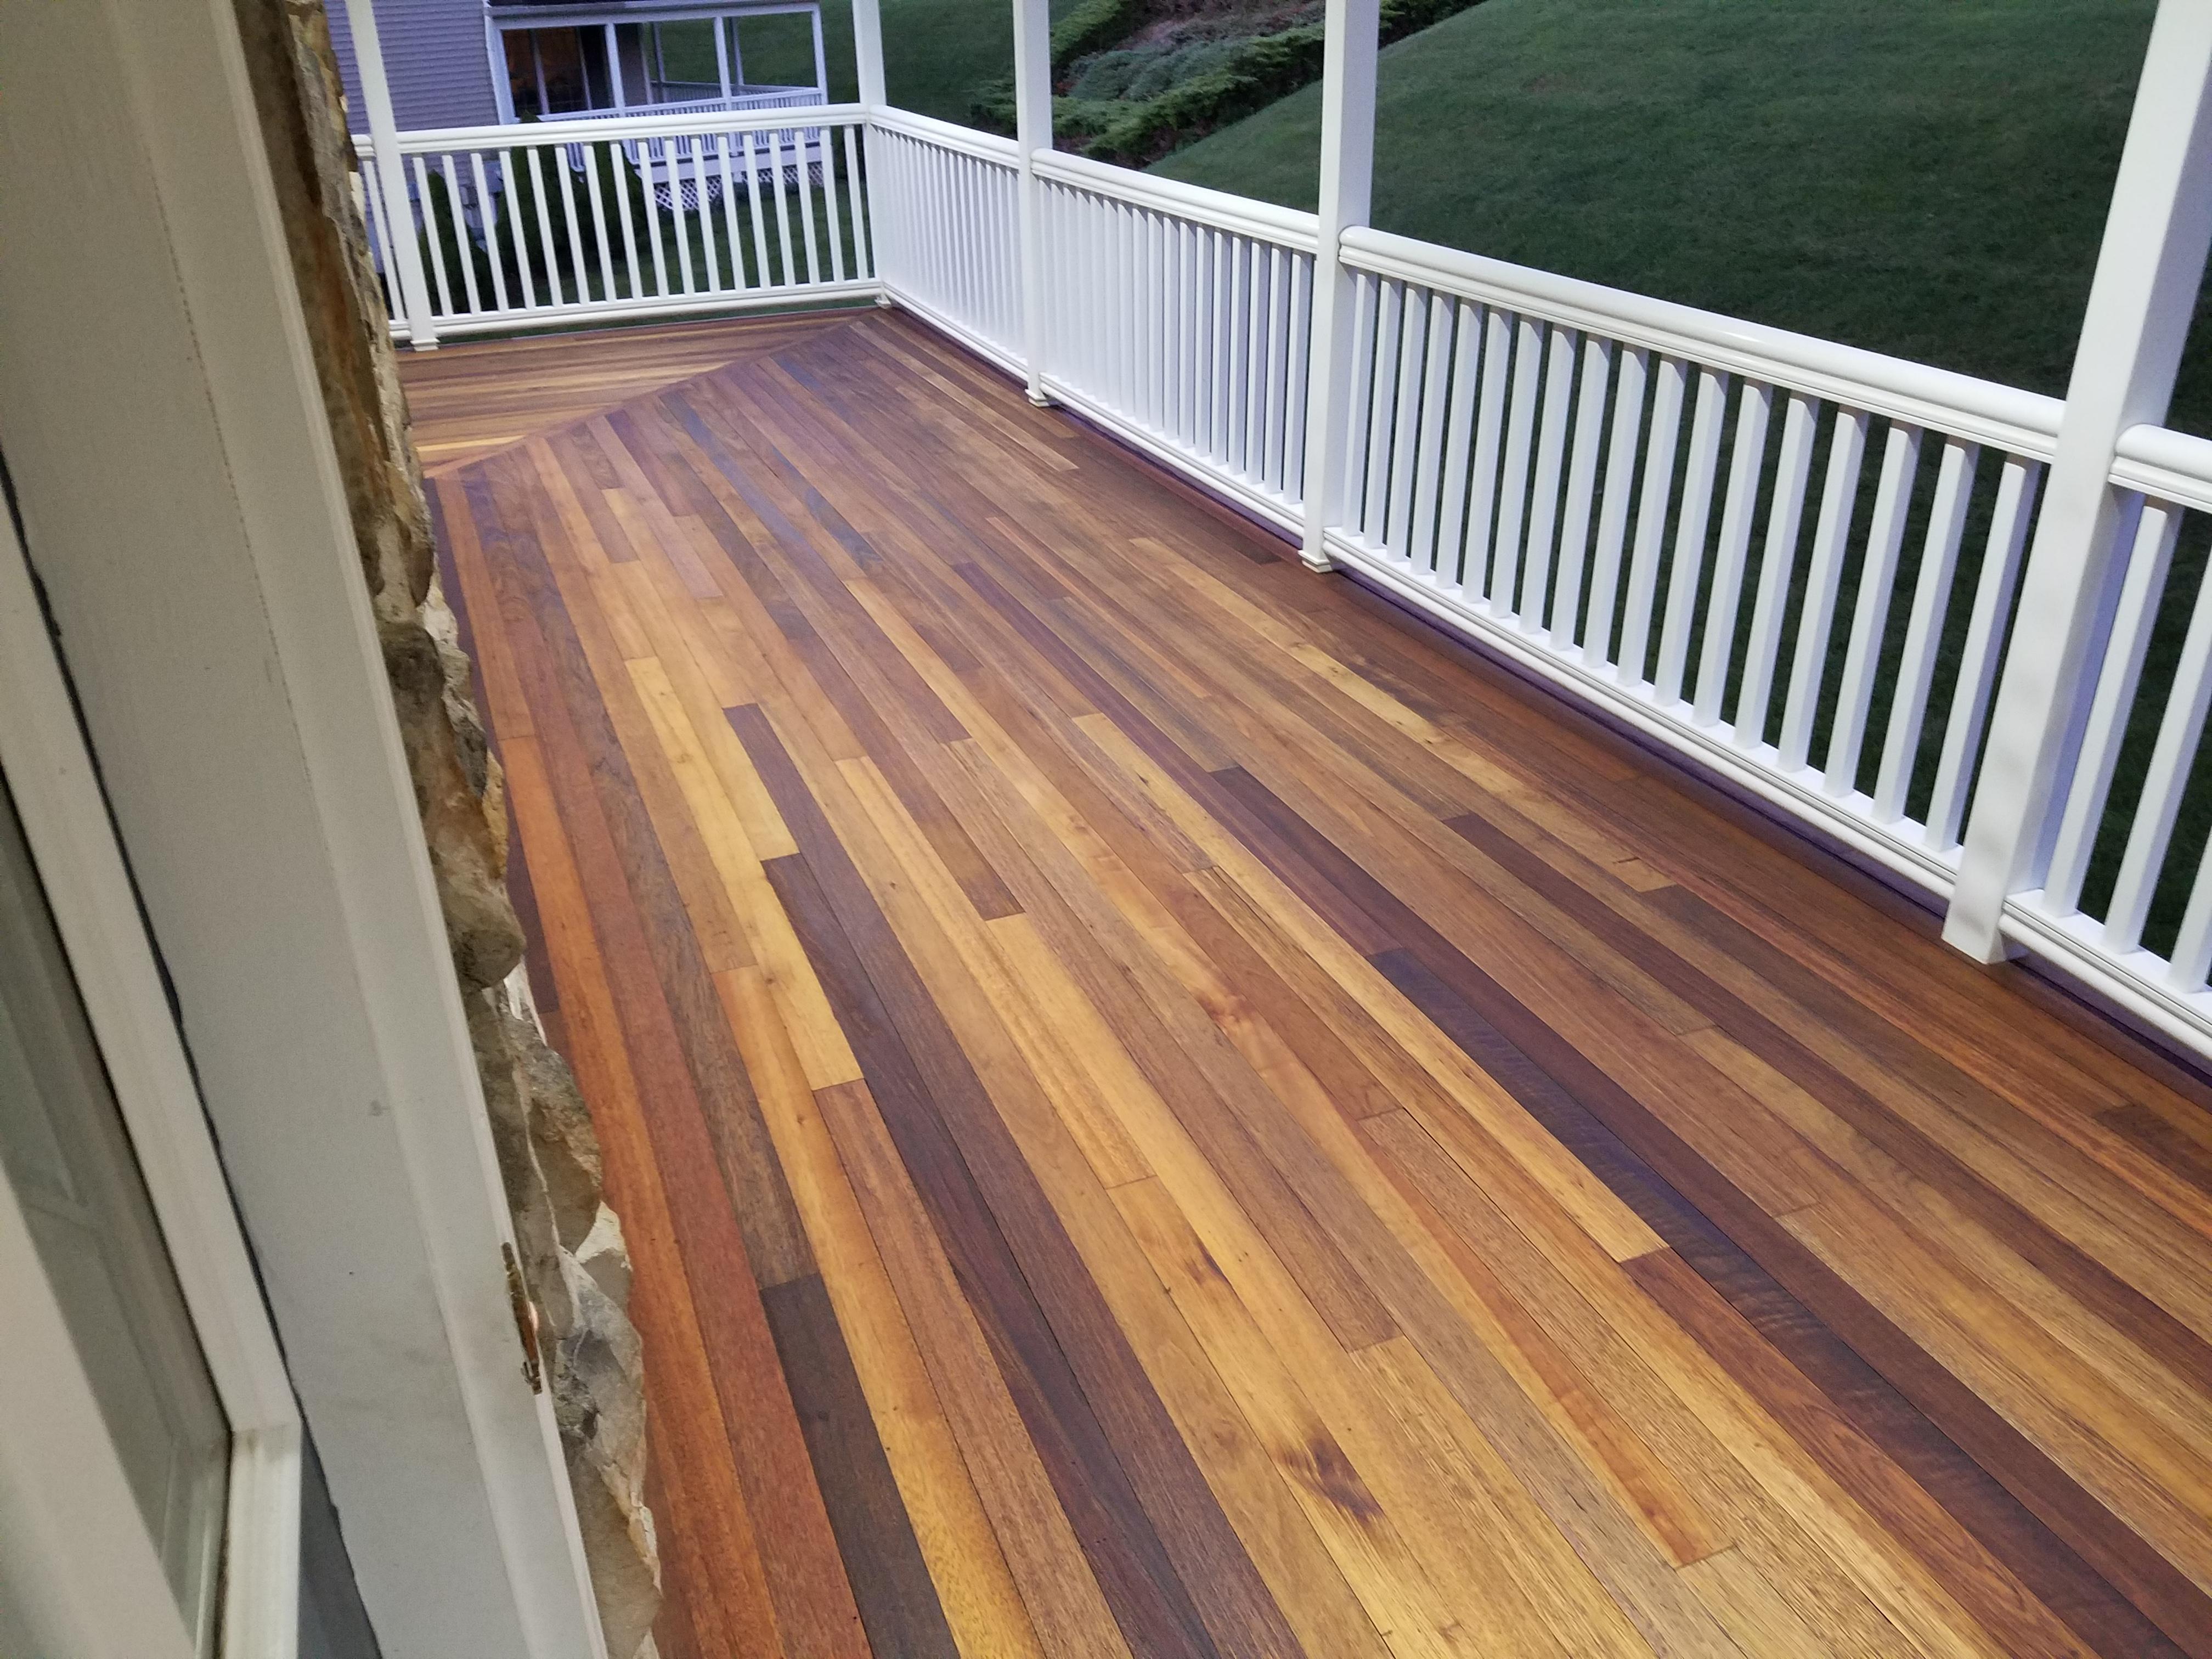 Penofin For Hardwood Deck Stain